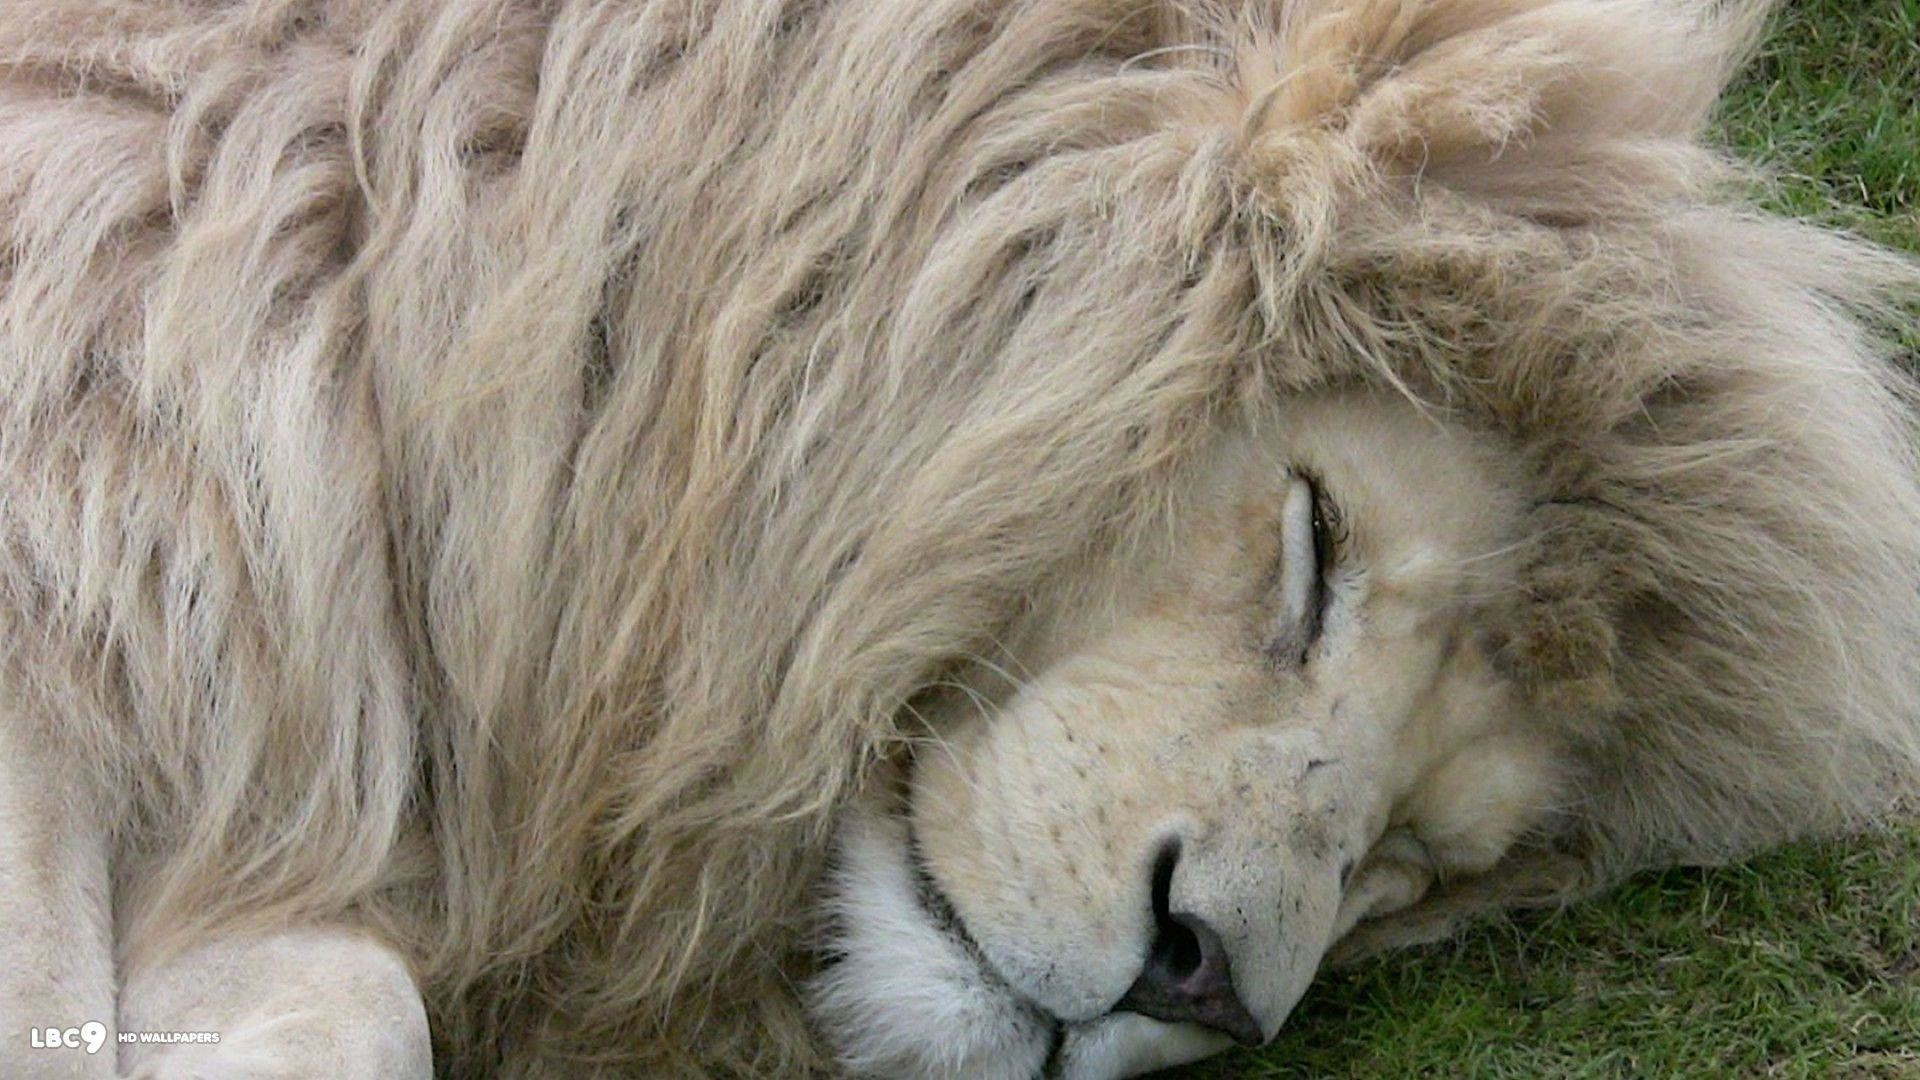 White Lion Wallpapers – HD Wallpapers Inn